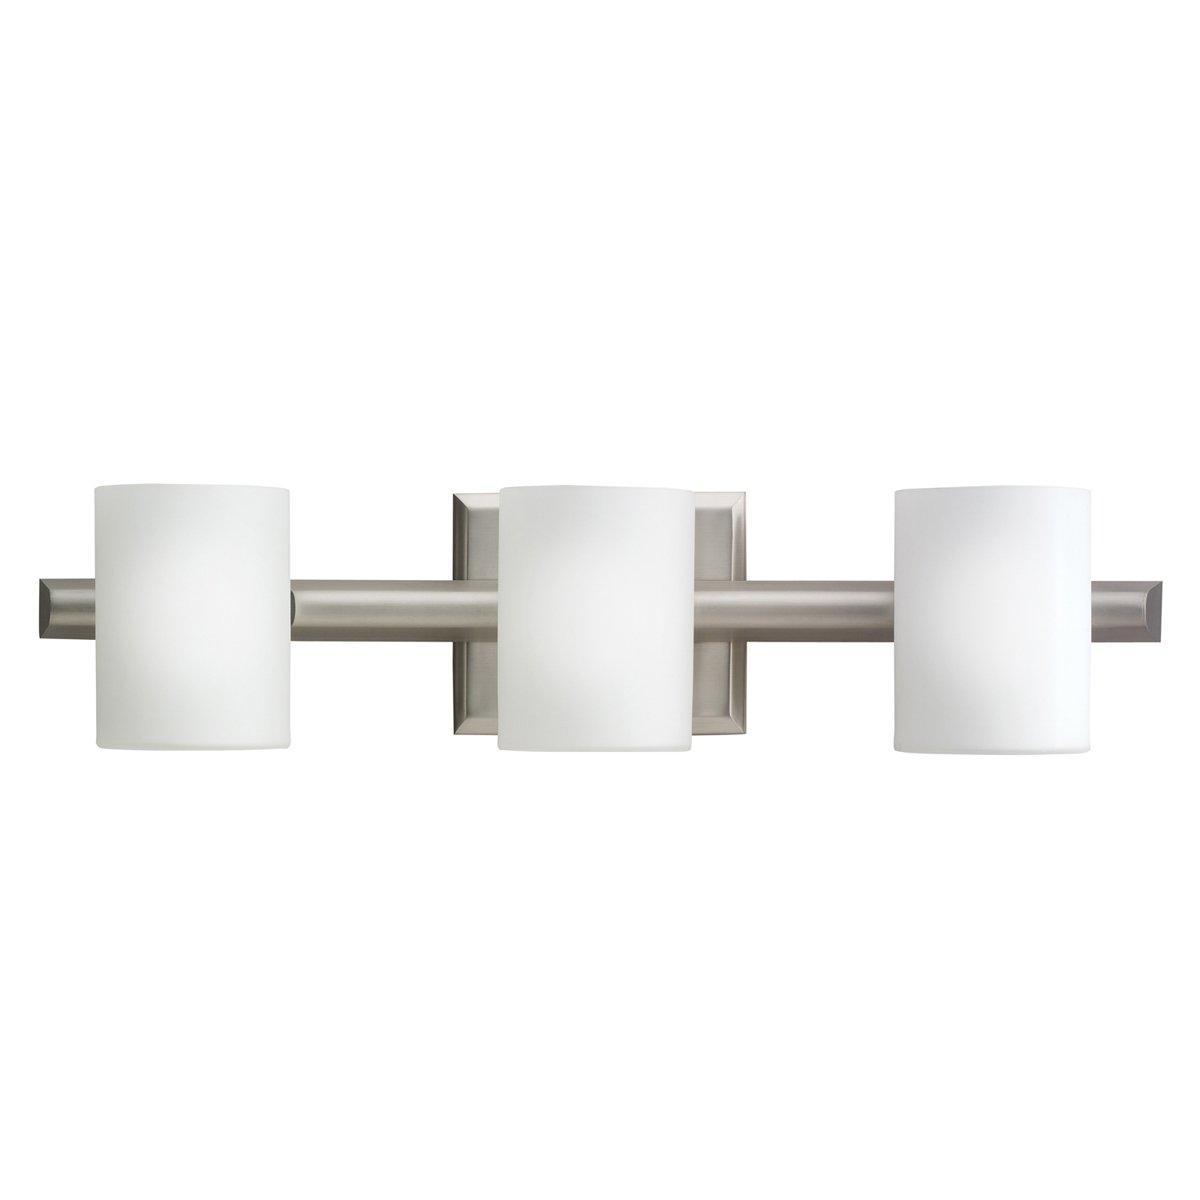 Kichler NI Tubes Bath Light Halogen Brushed Nickel Vanity - Halogen bathroom vanity lights